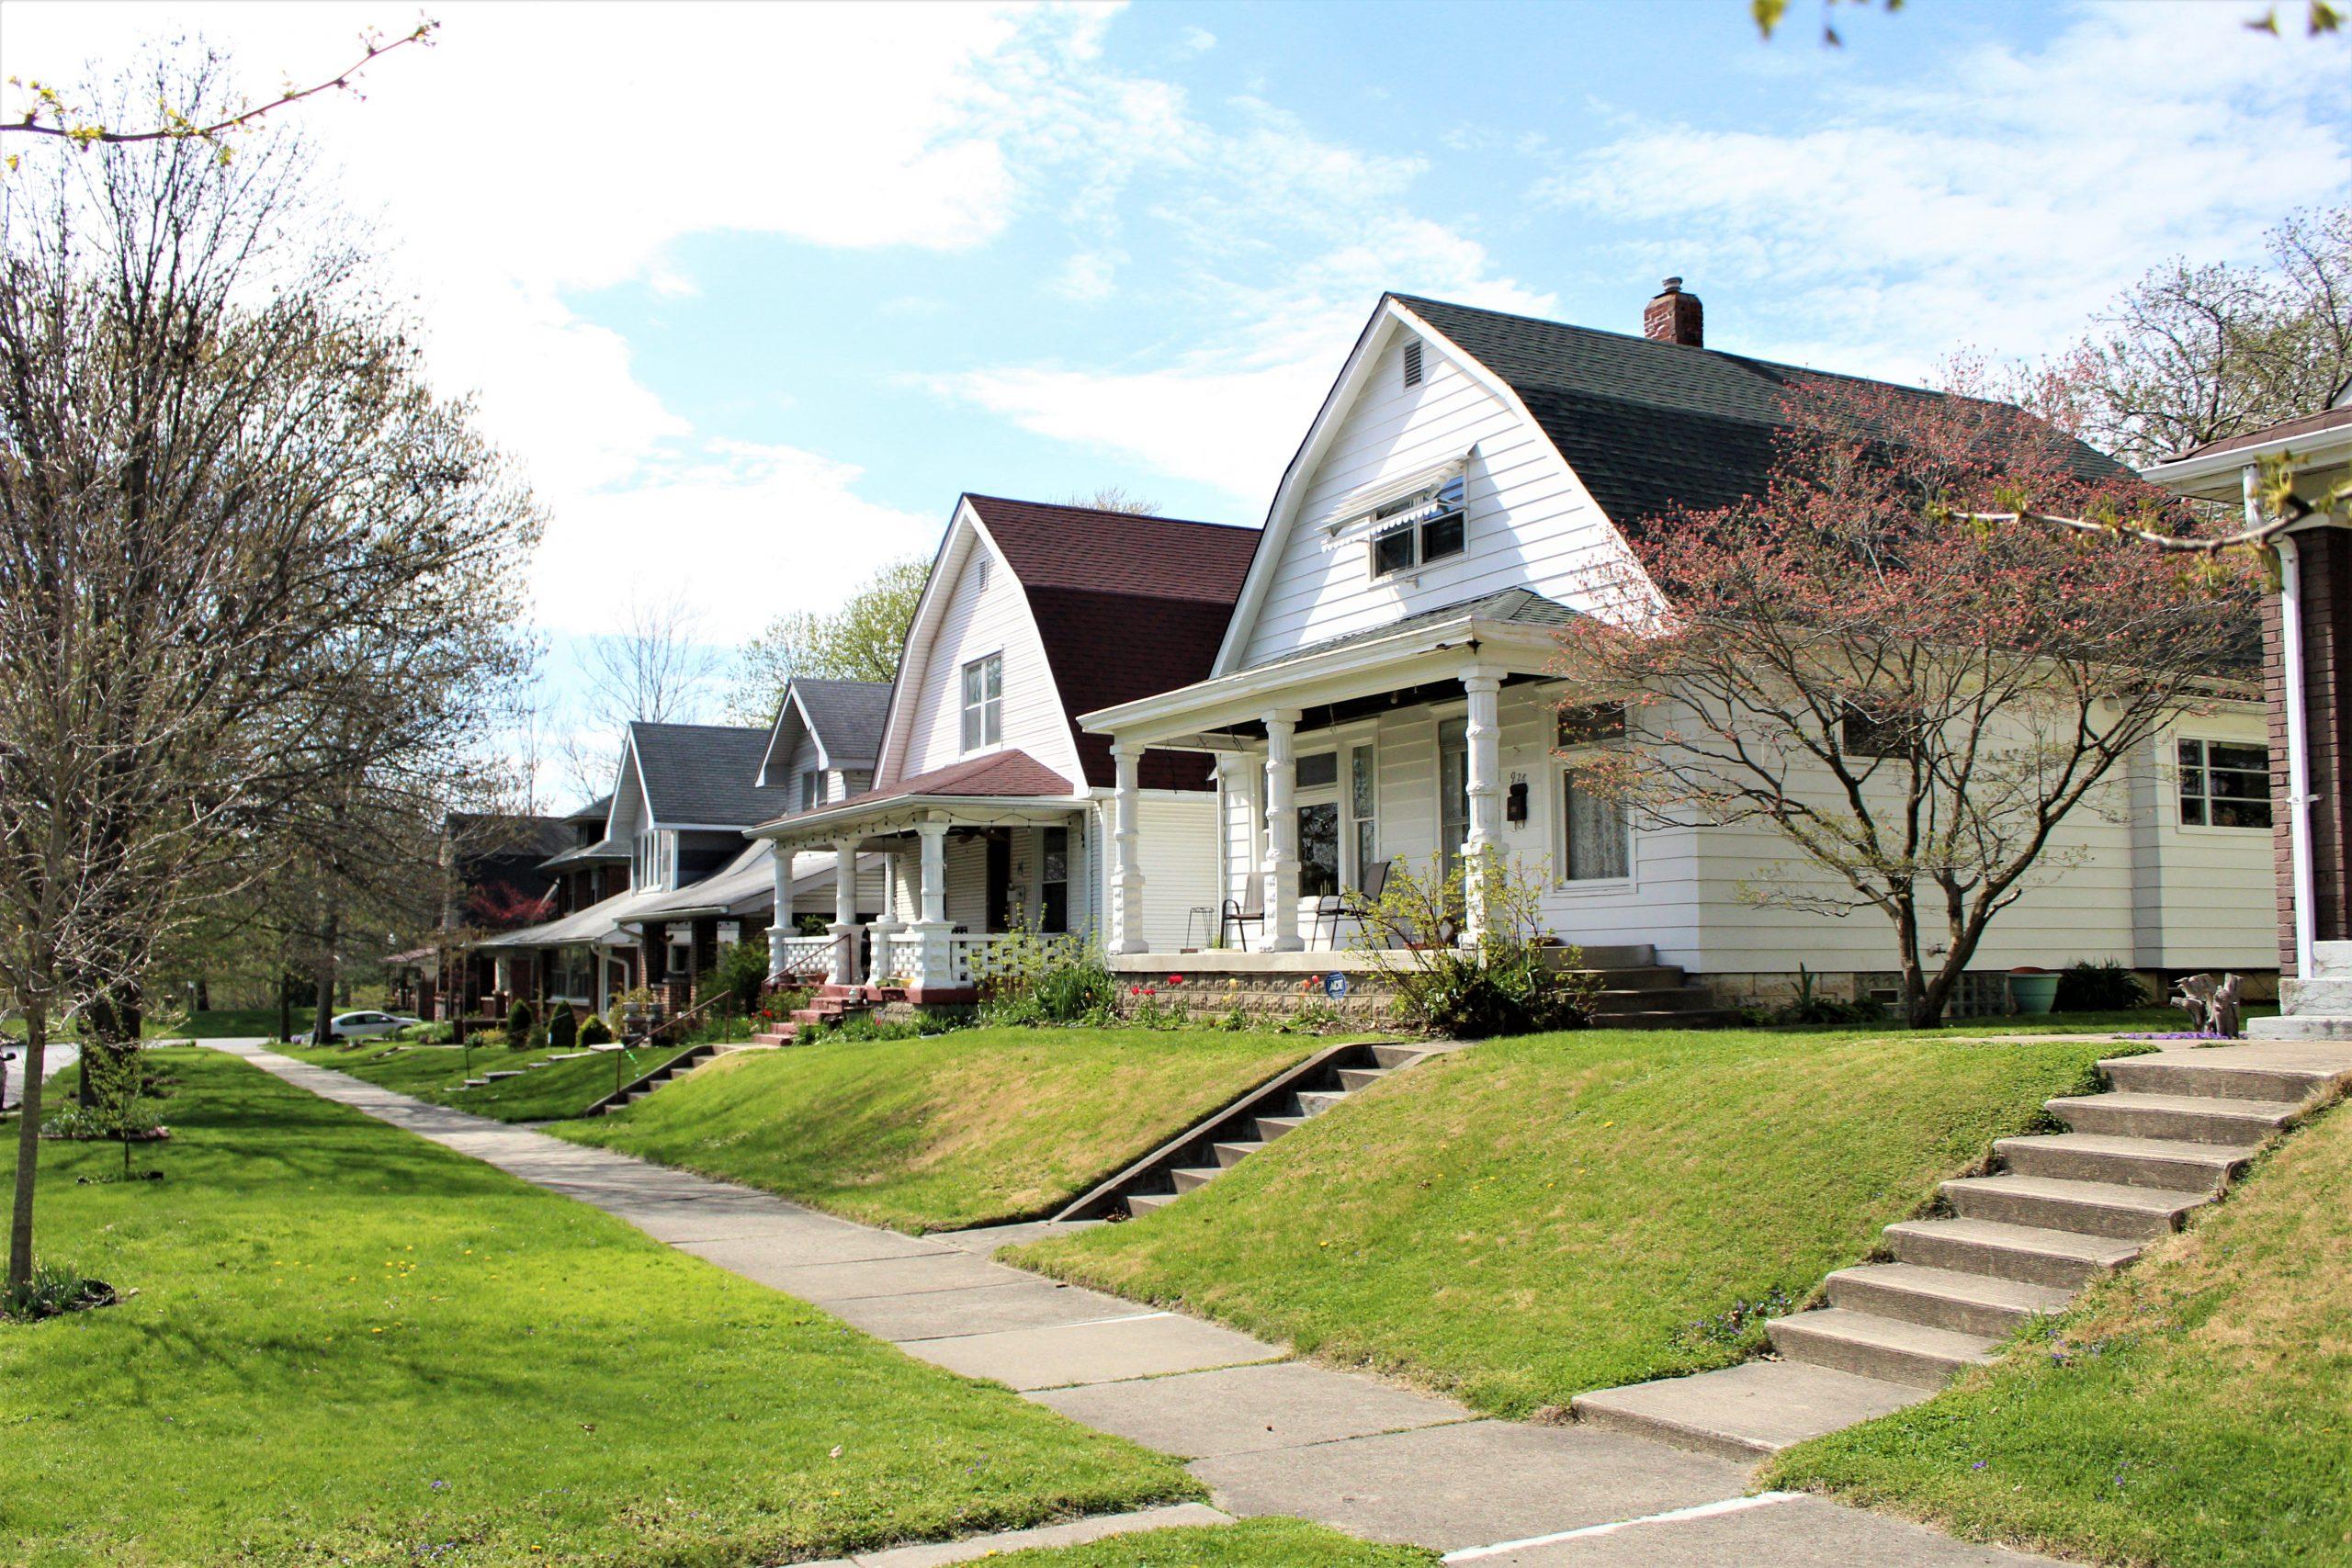 Garfield Park - Homes